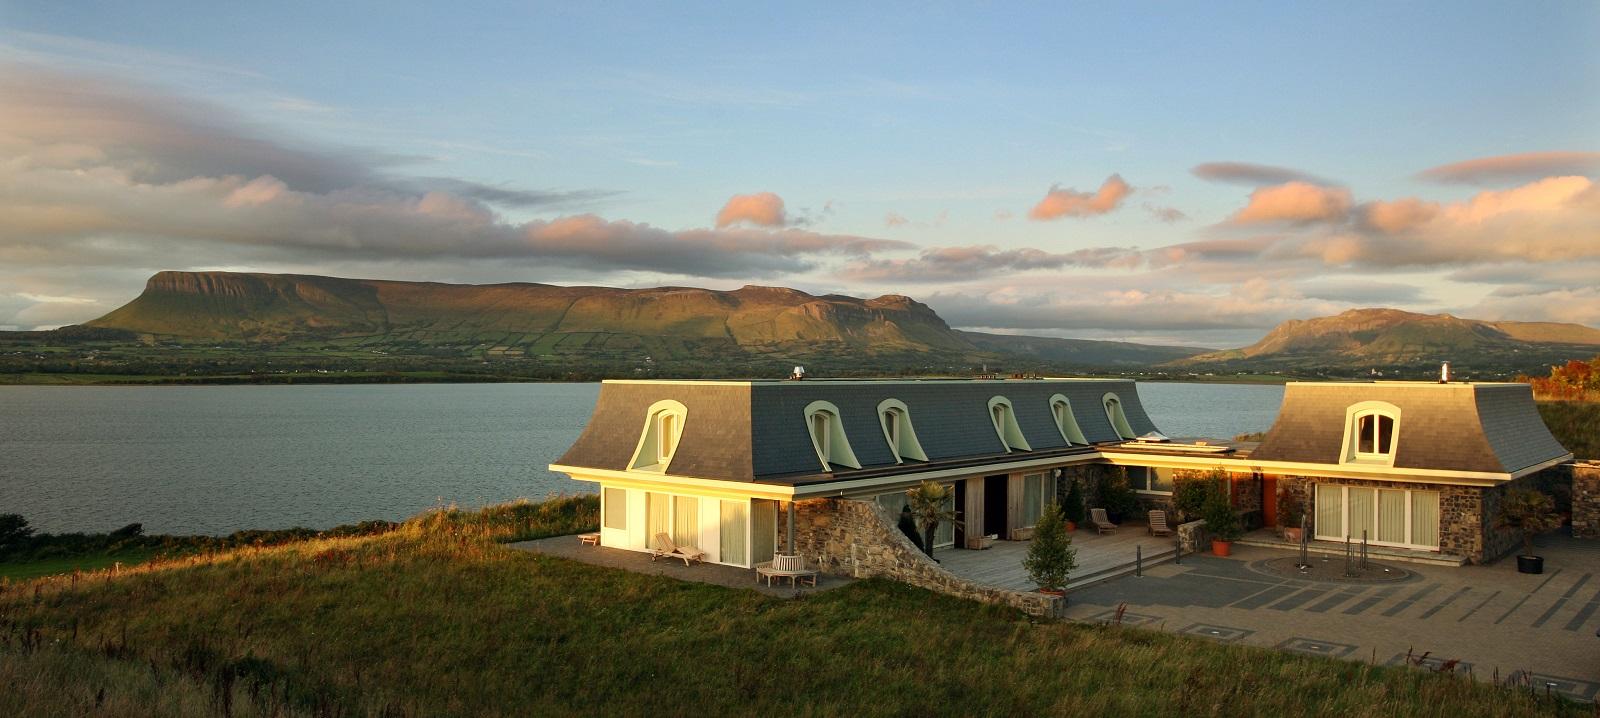 Sea View House Rosses Point Co Sligo Luxury Holiday Home